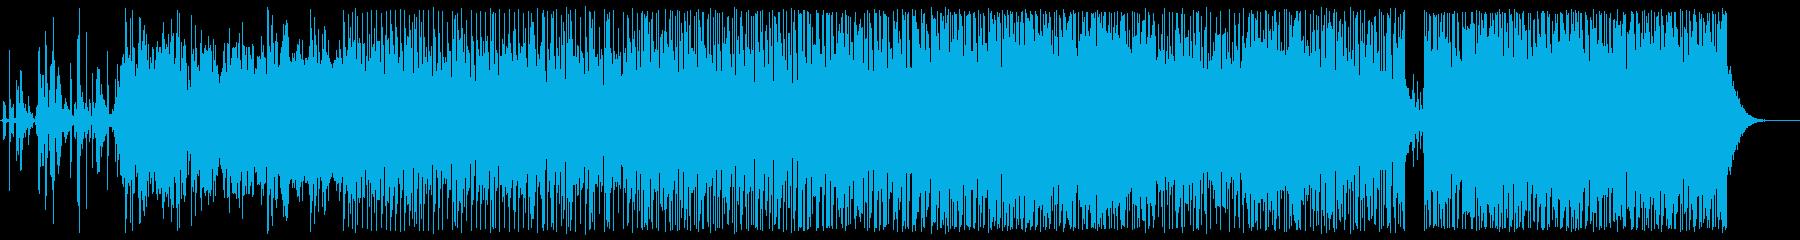 SF系宇宙感のあるシンセサイザーサウンドの再生済みの波形